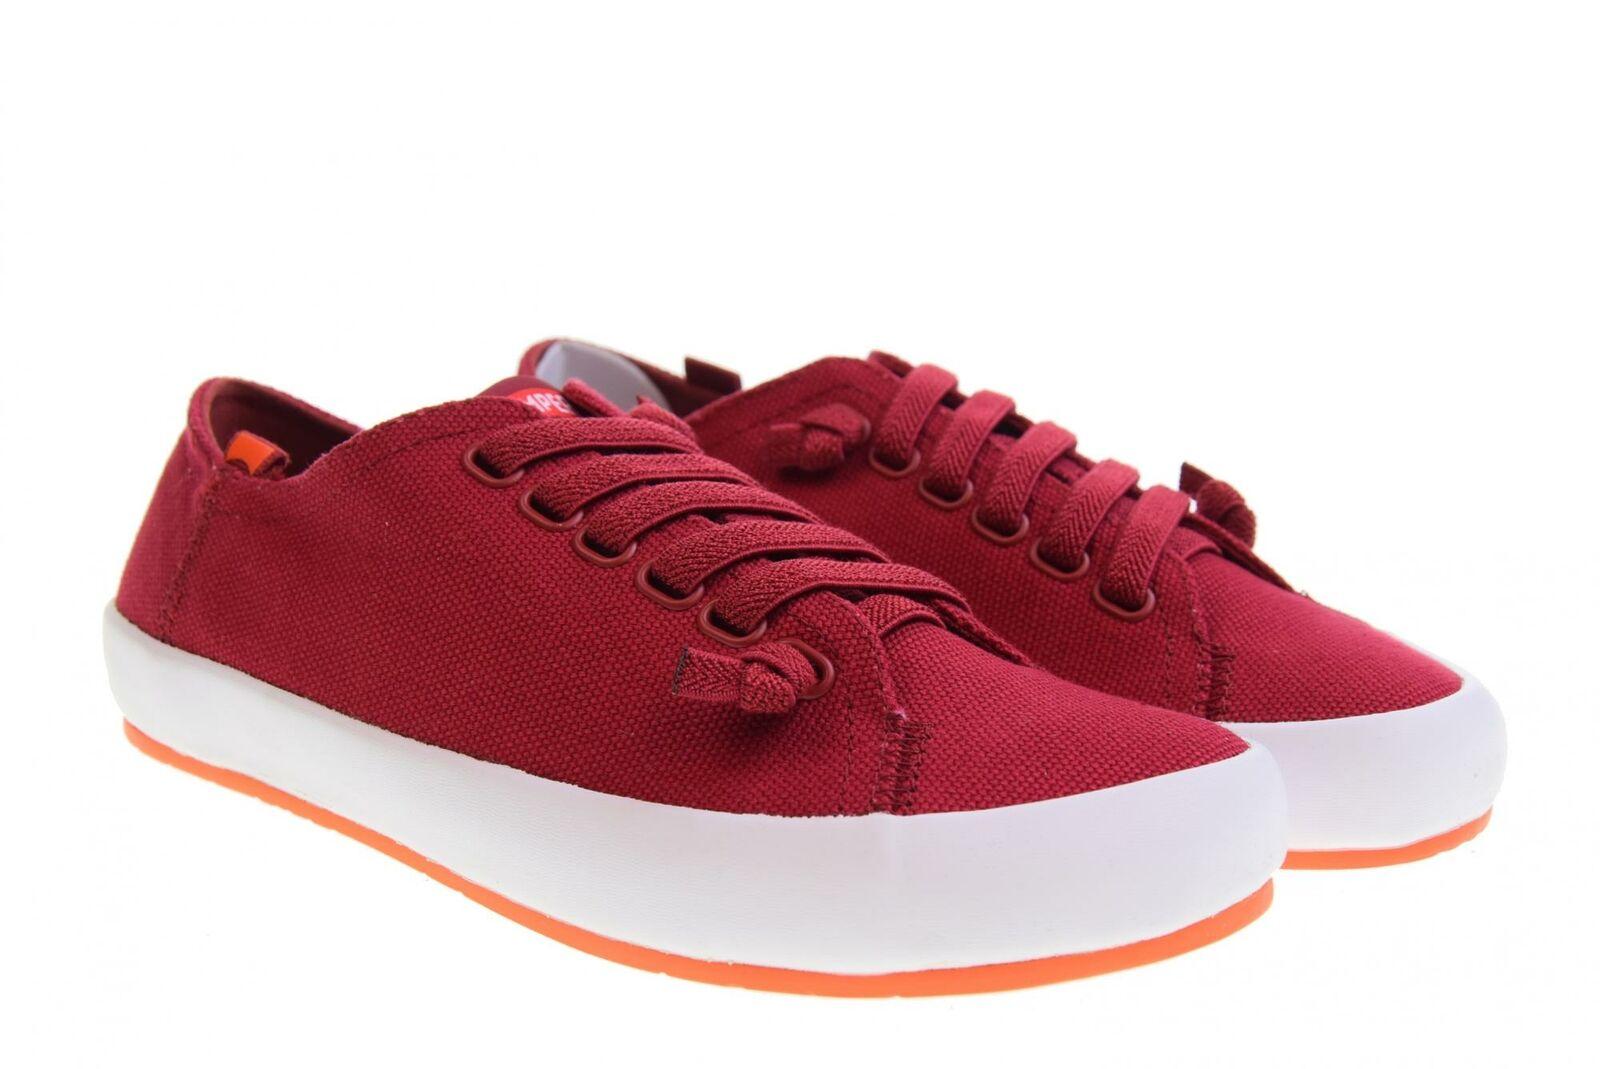 Camper P19s shoes women zapatillas bajas 21897-047 red